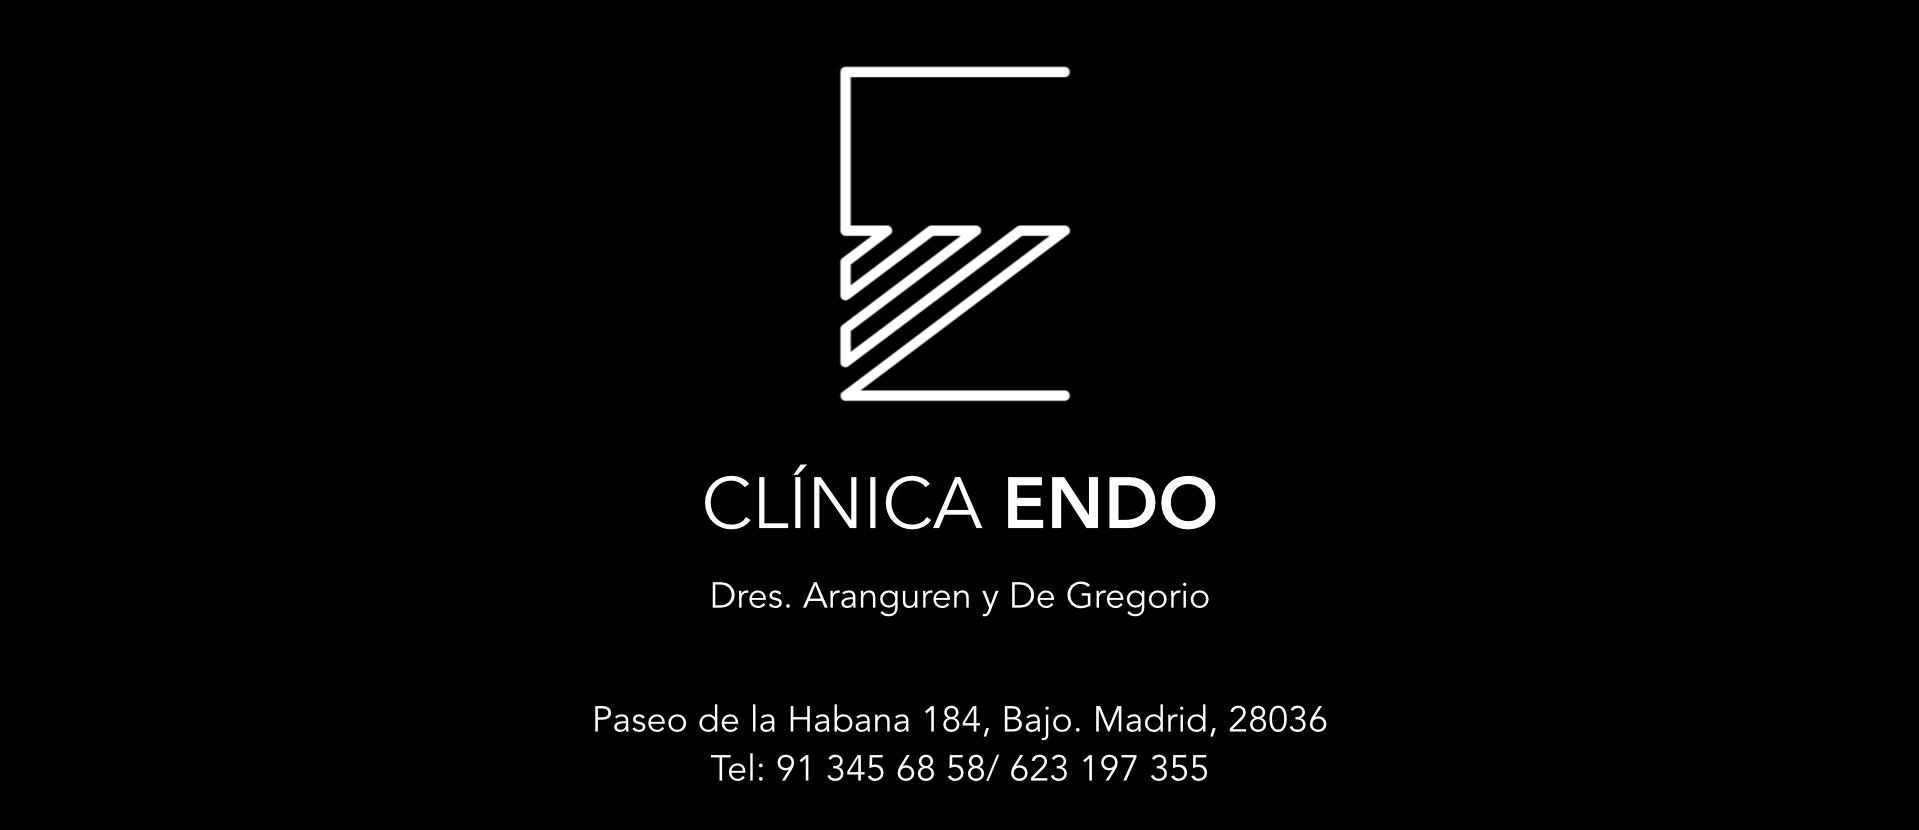 Clinica Endo